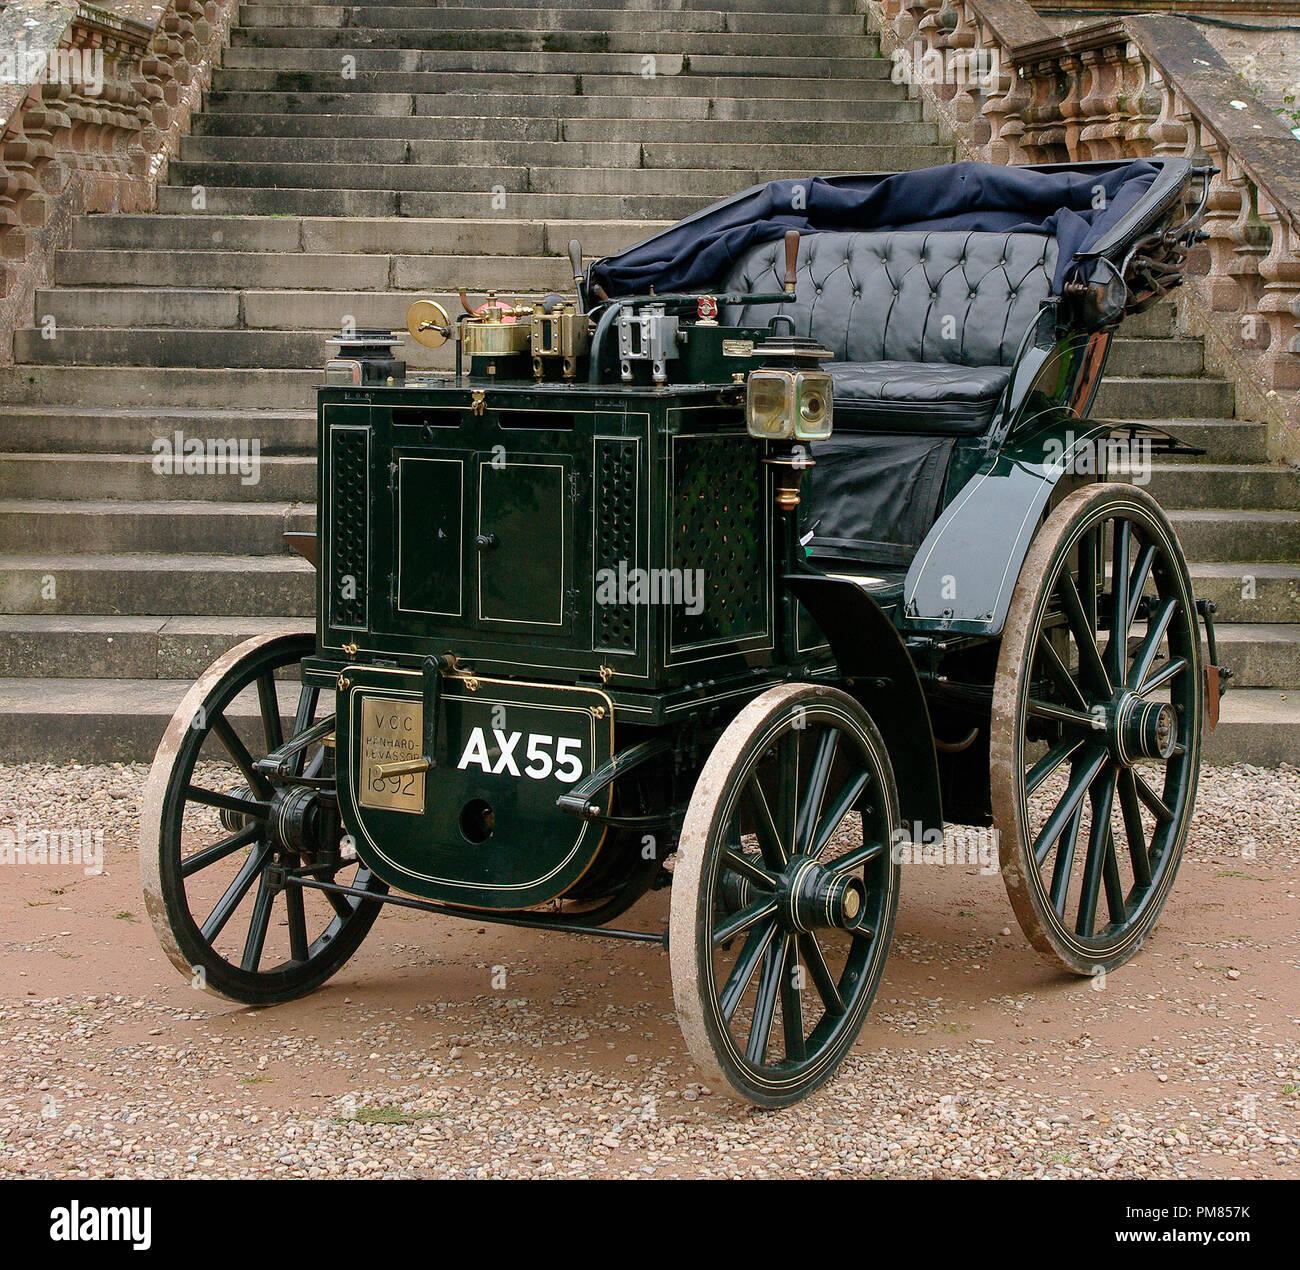 1892 Panhard et Levassor Automobil Stockbild